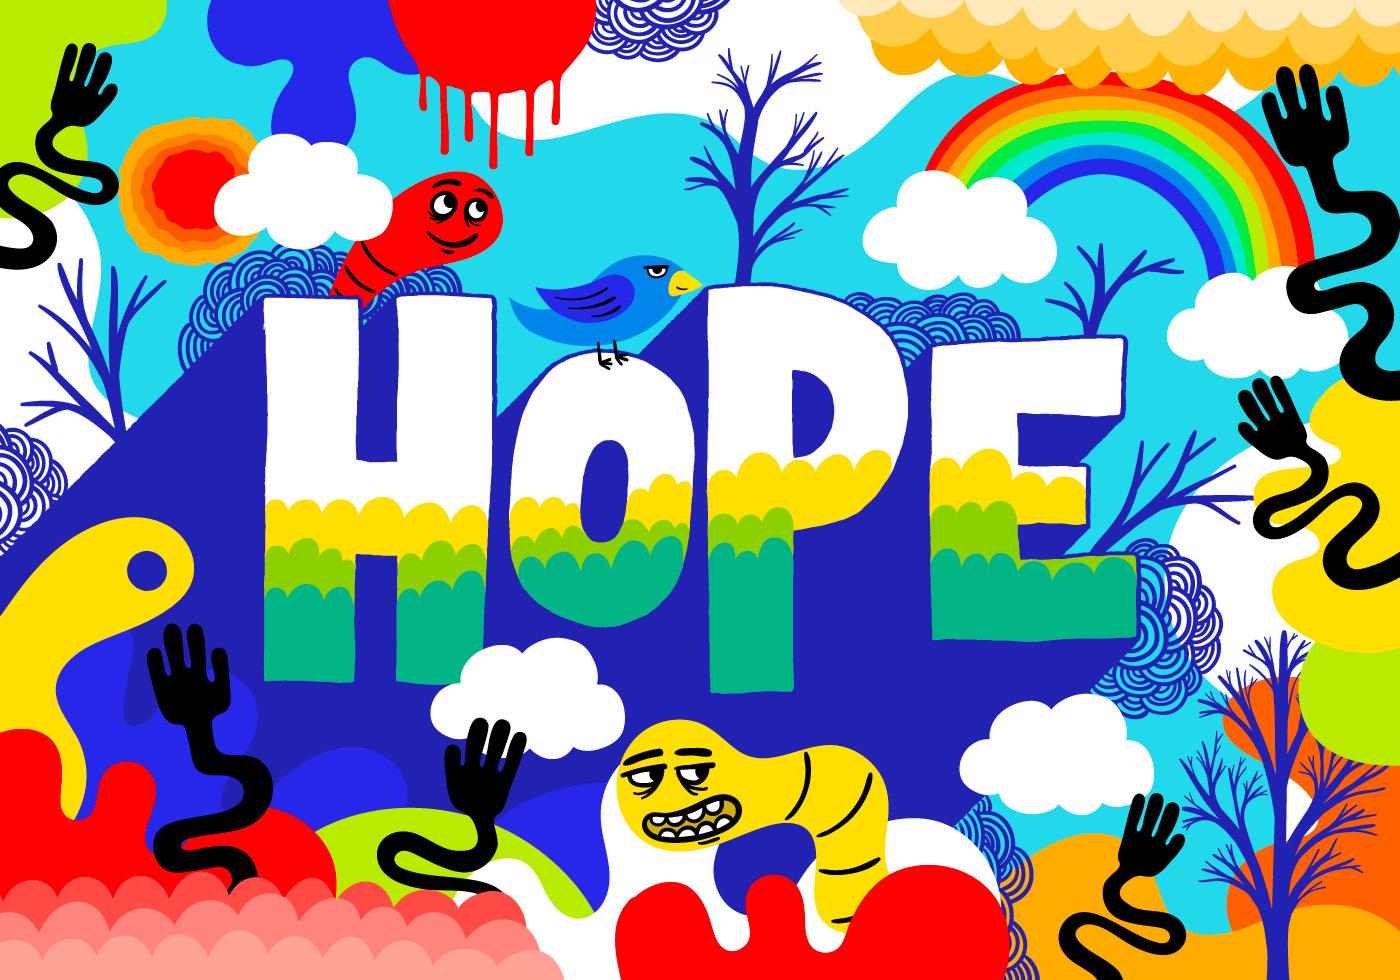 colorful hope lettering illustration